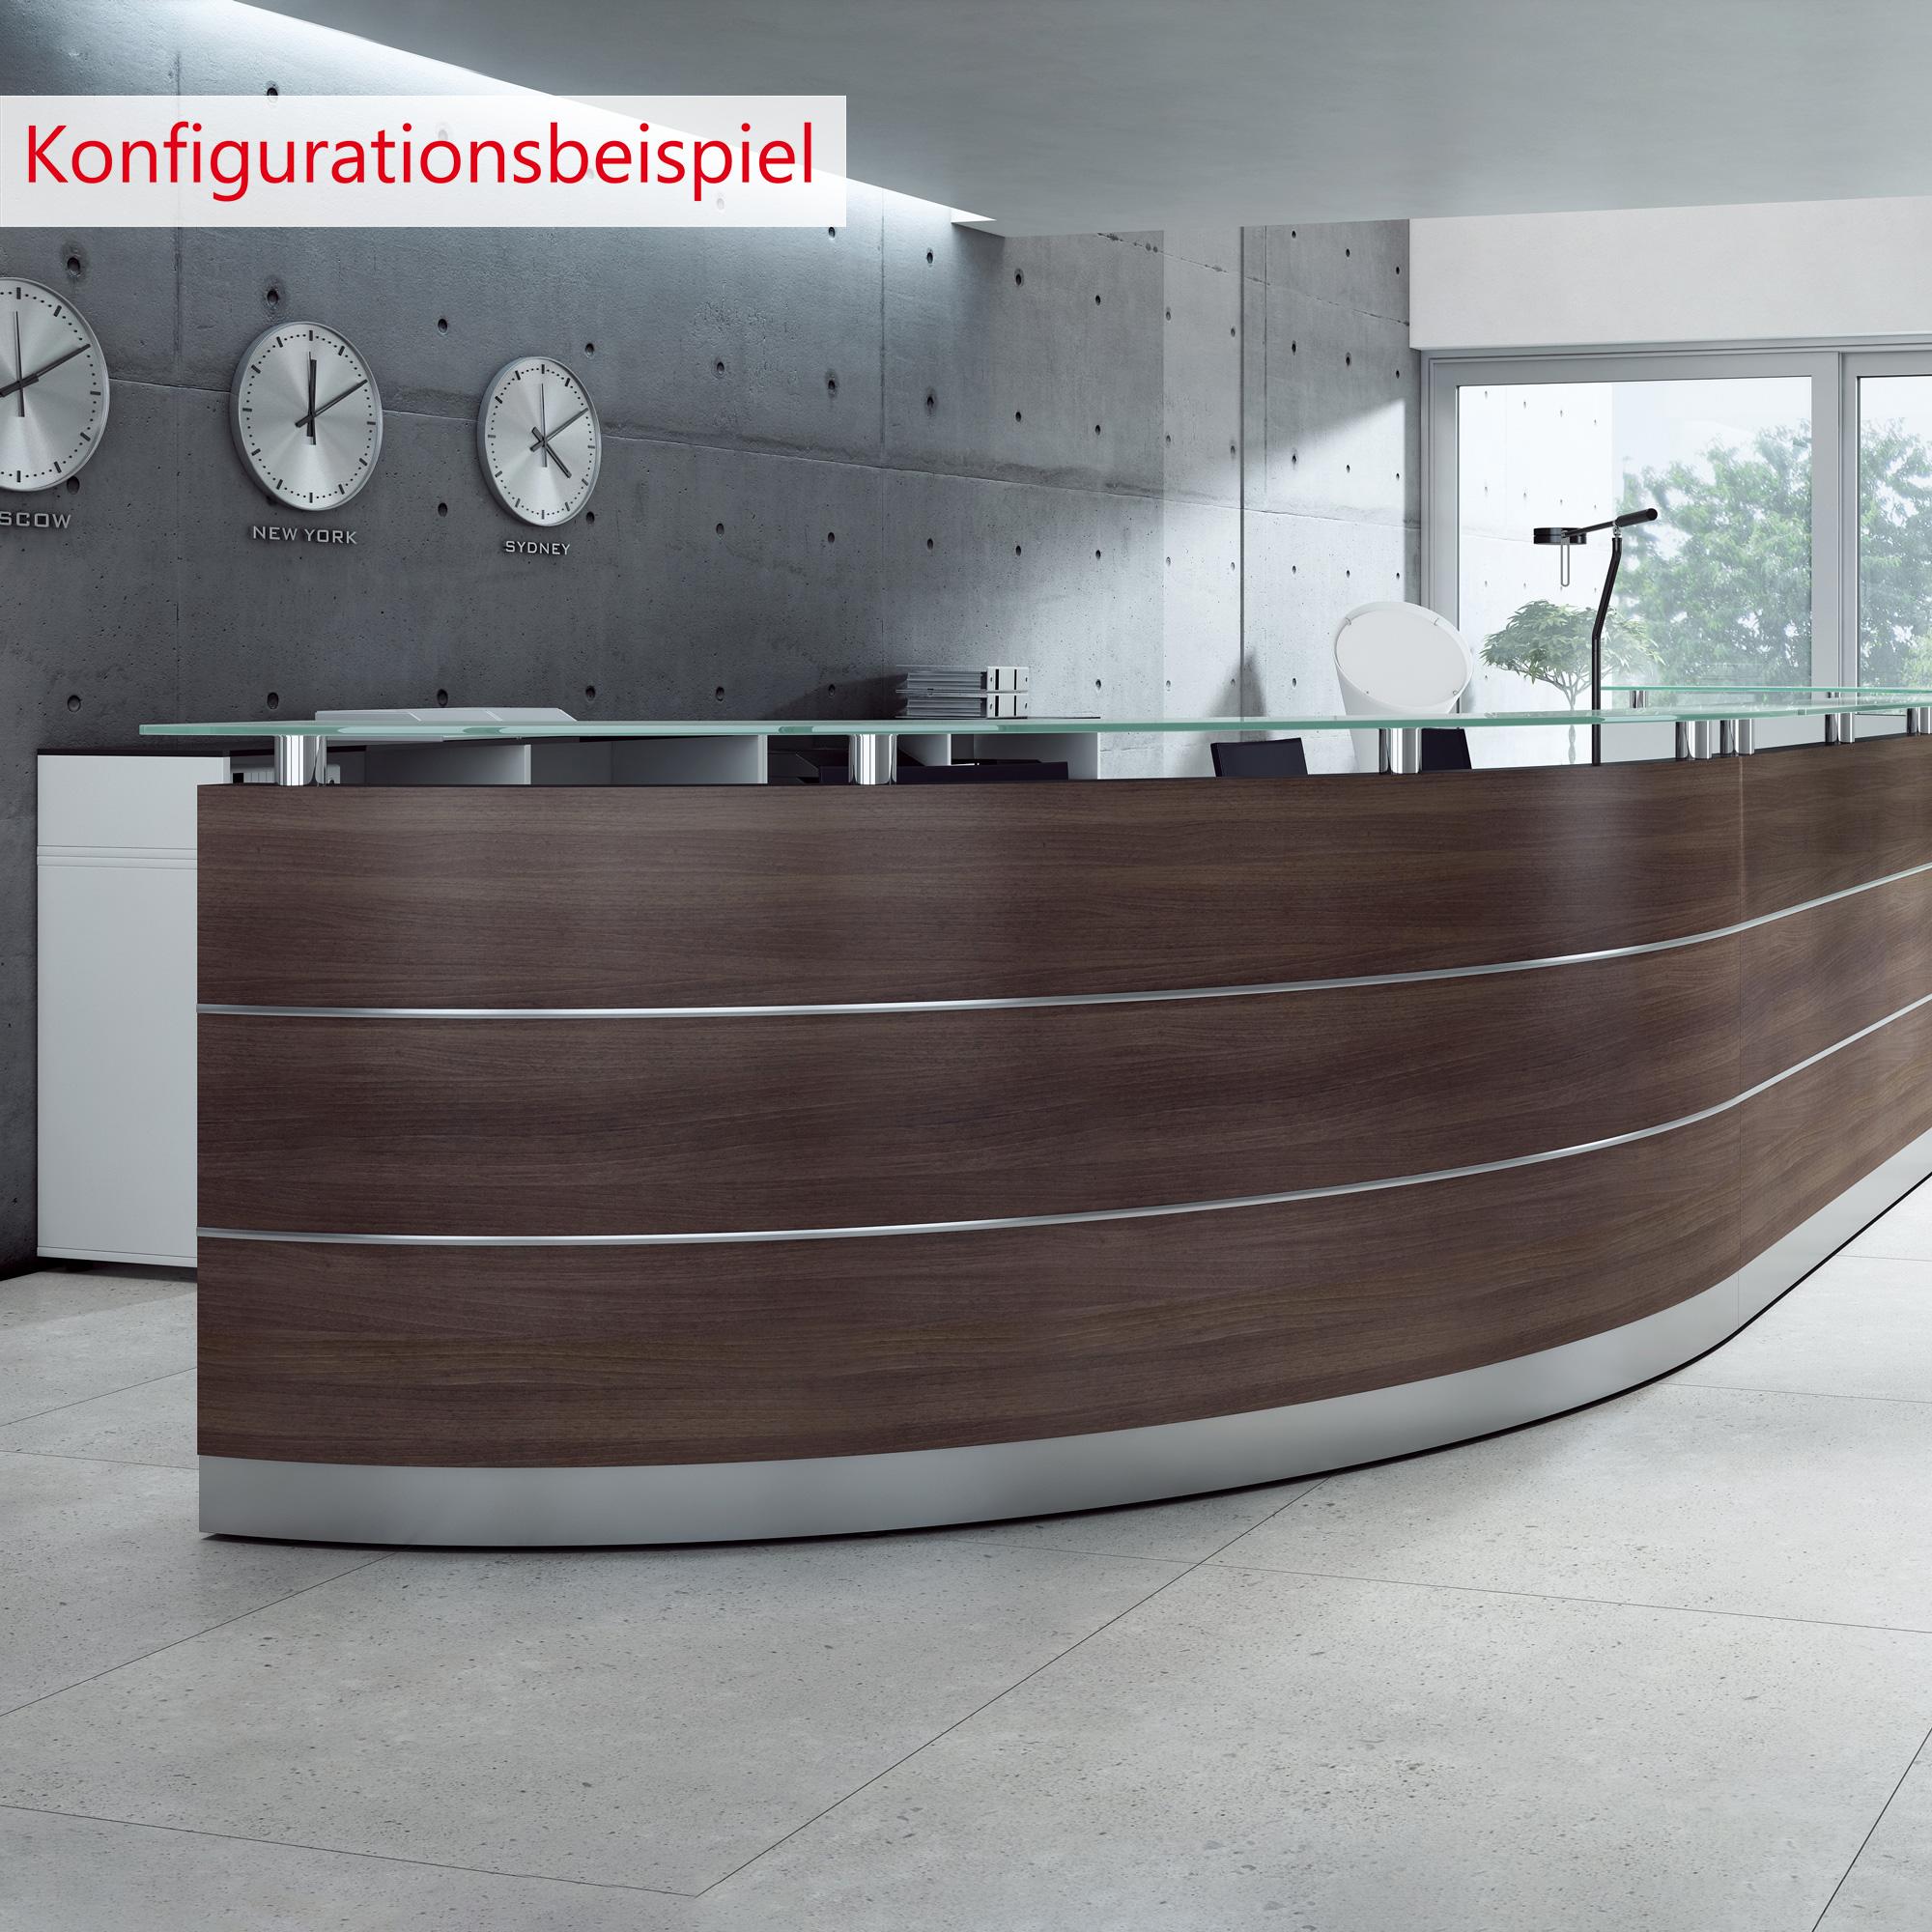 Empfangstheke Theke Rezeption Arzttheke Lieferung & Montage kostenlos MALAGA